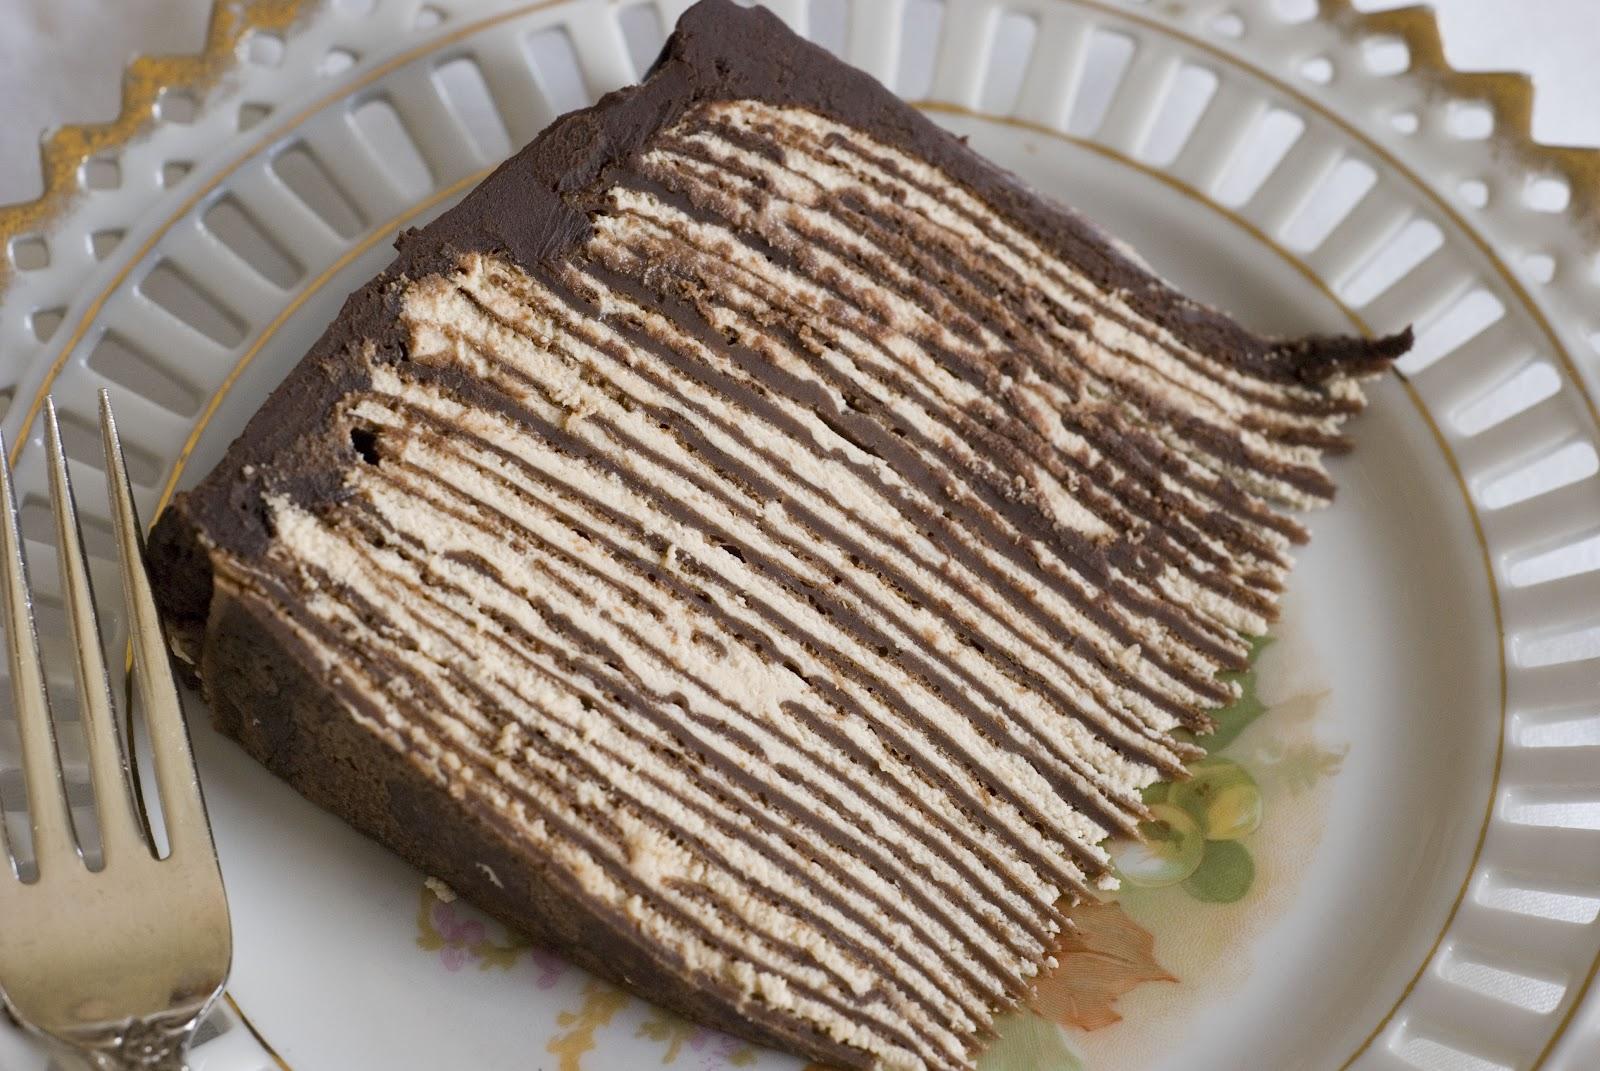 Crepe Cake With Chocolate Ganache